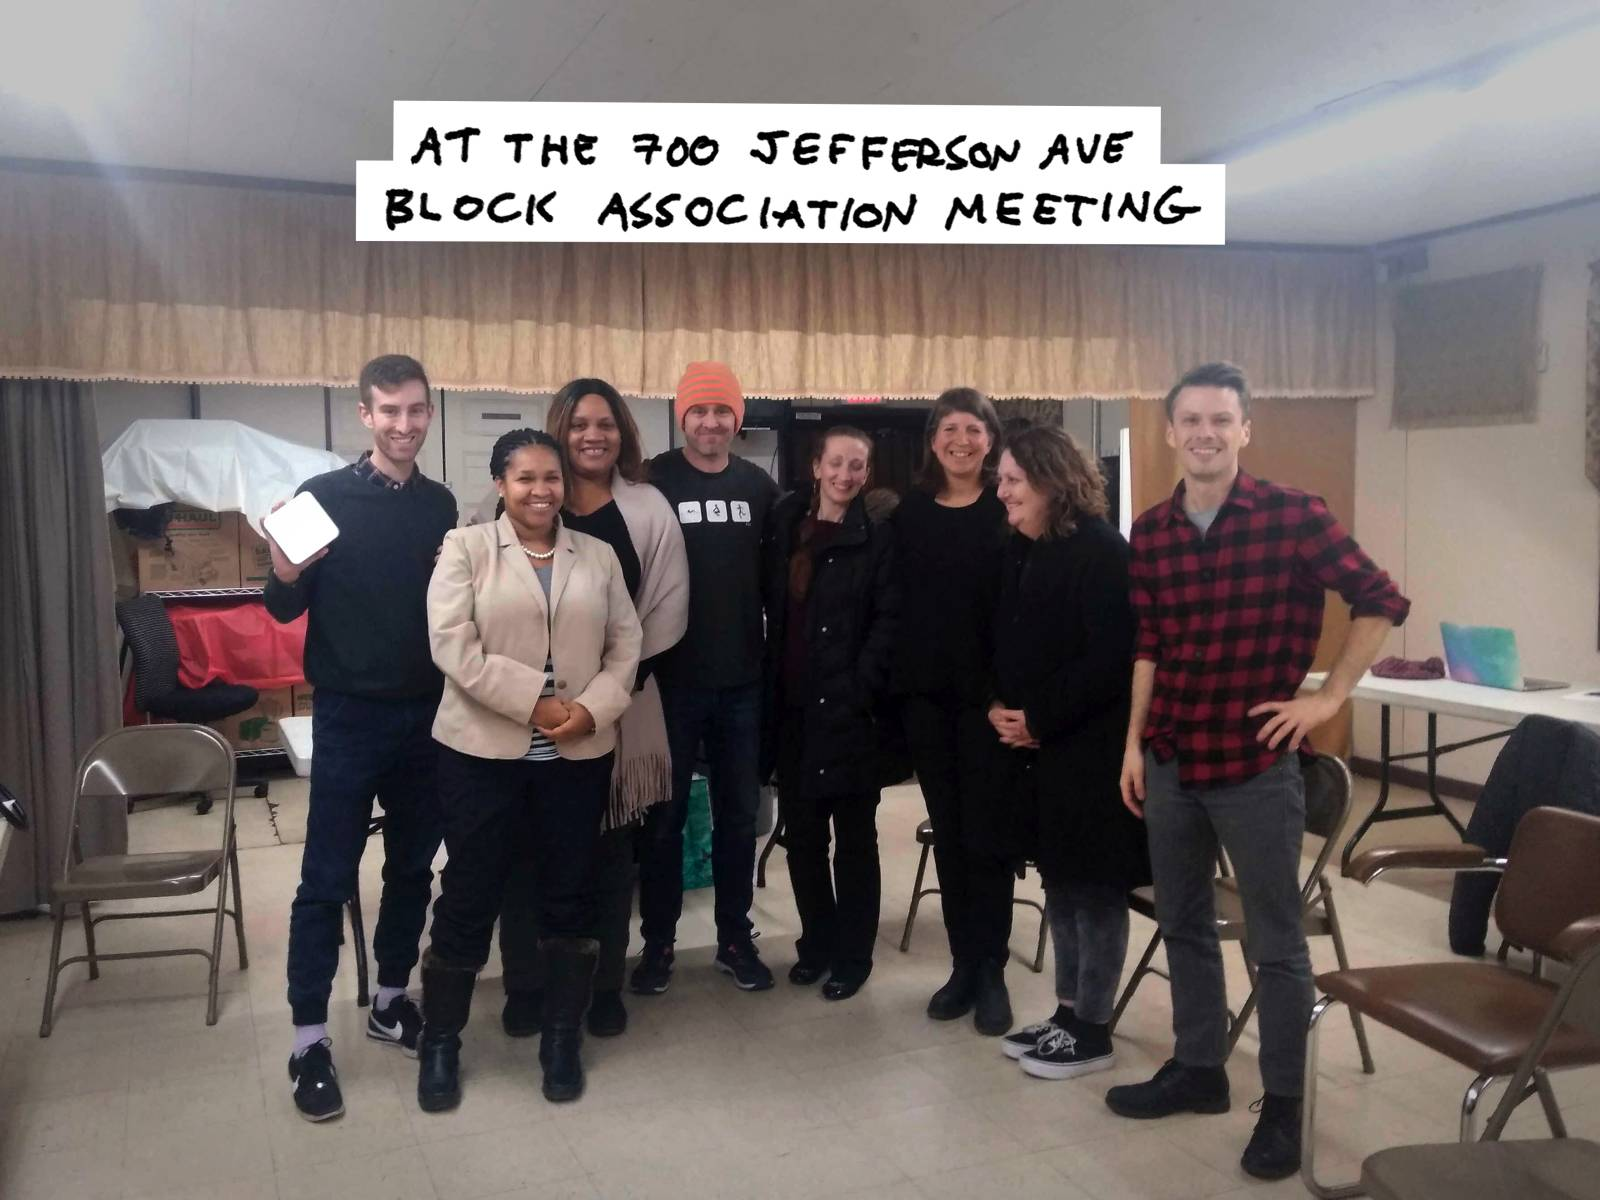 Block association meeting